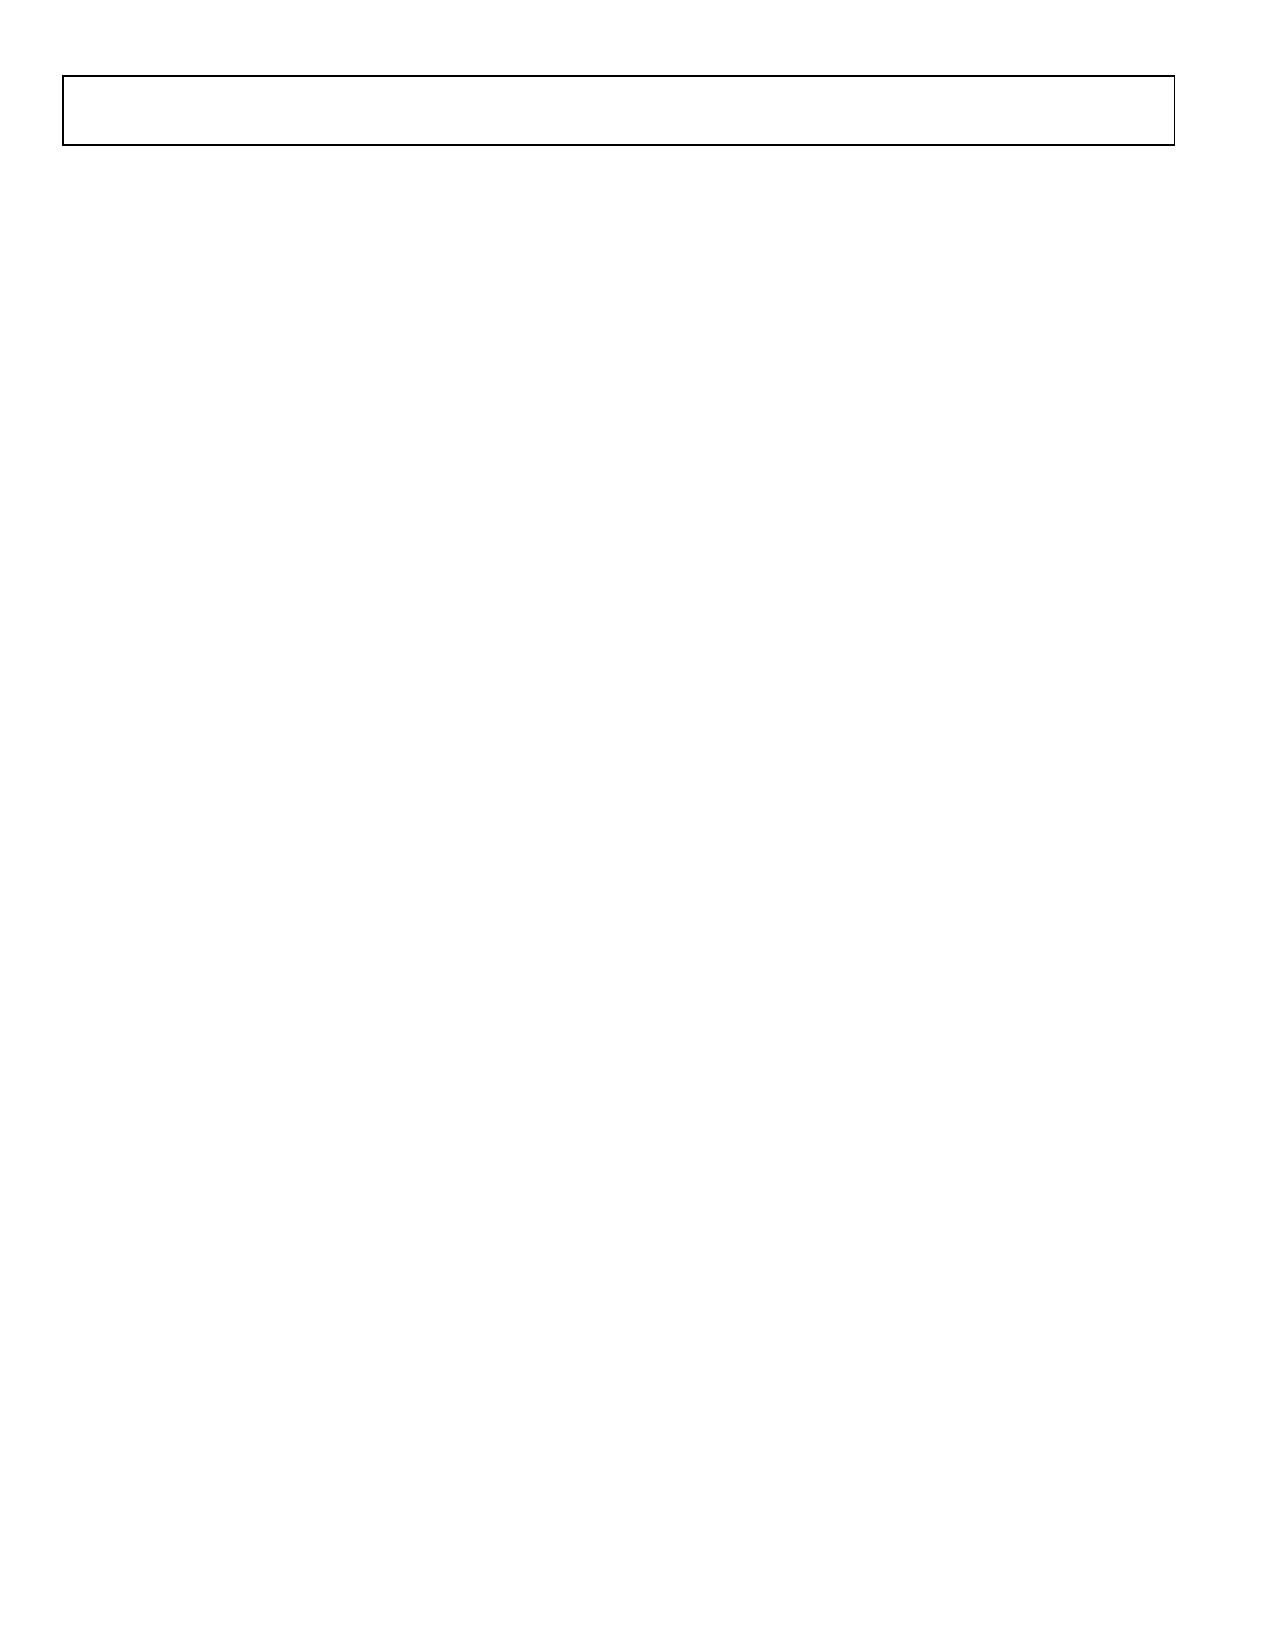 ADA4857-1 Даташит, Описание, Даташиты